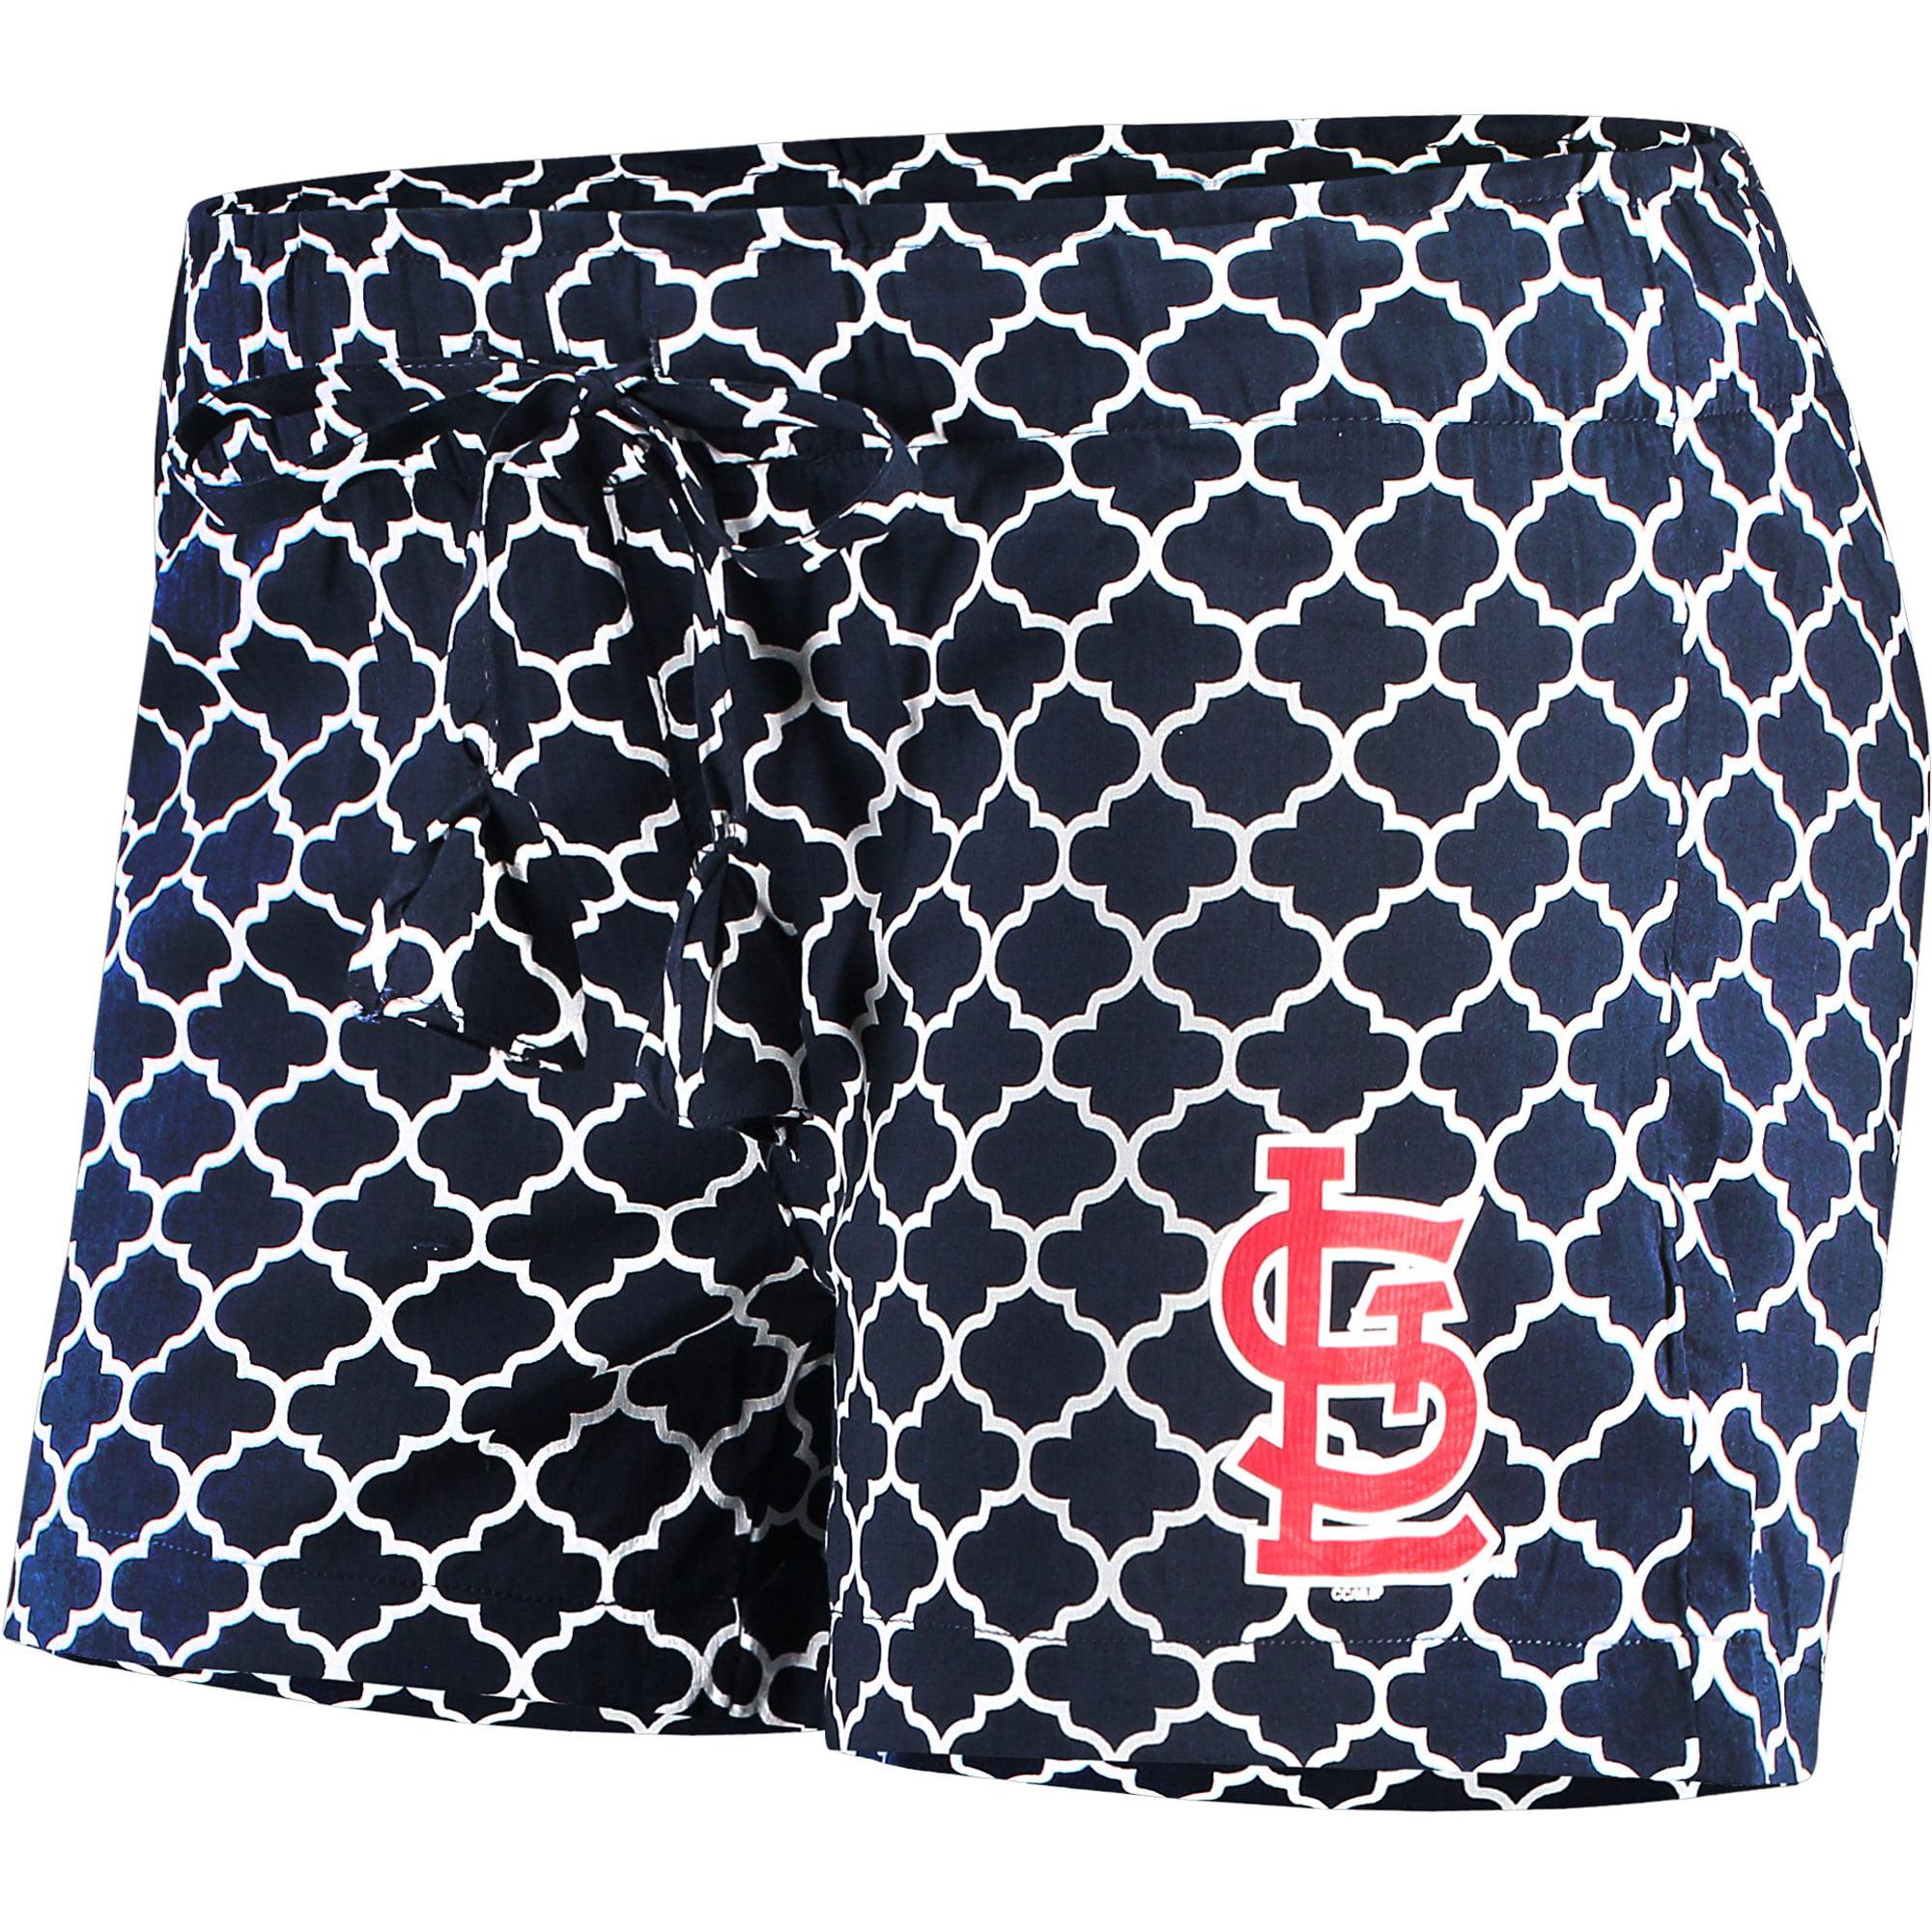 St. Louis Cardinals Concepts Sport Women's Slumber Sleep Shorts - Navy/White